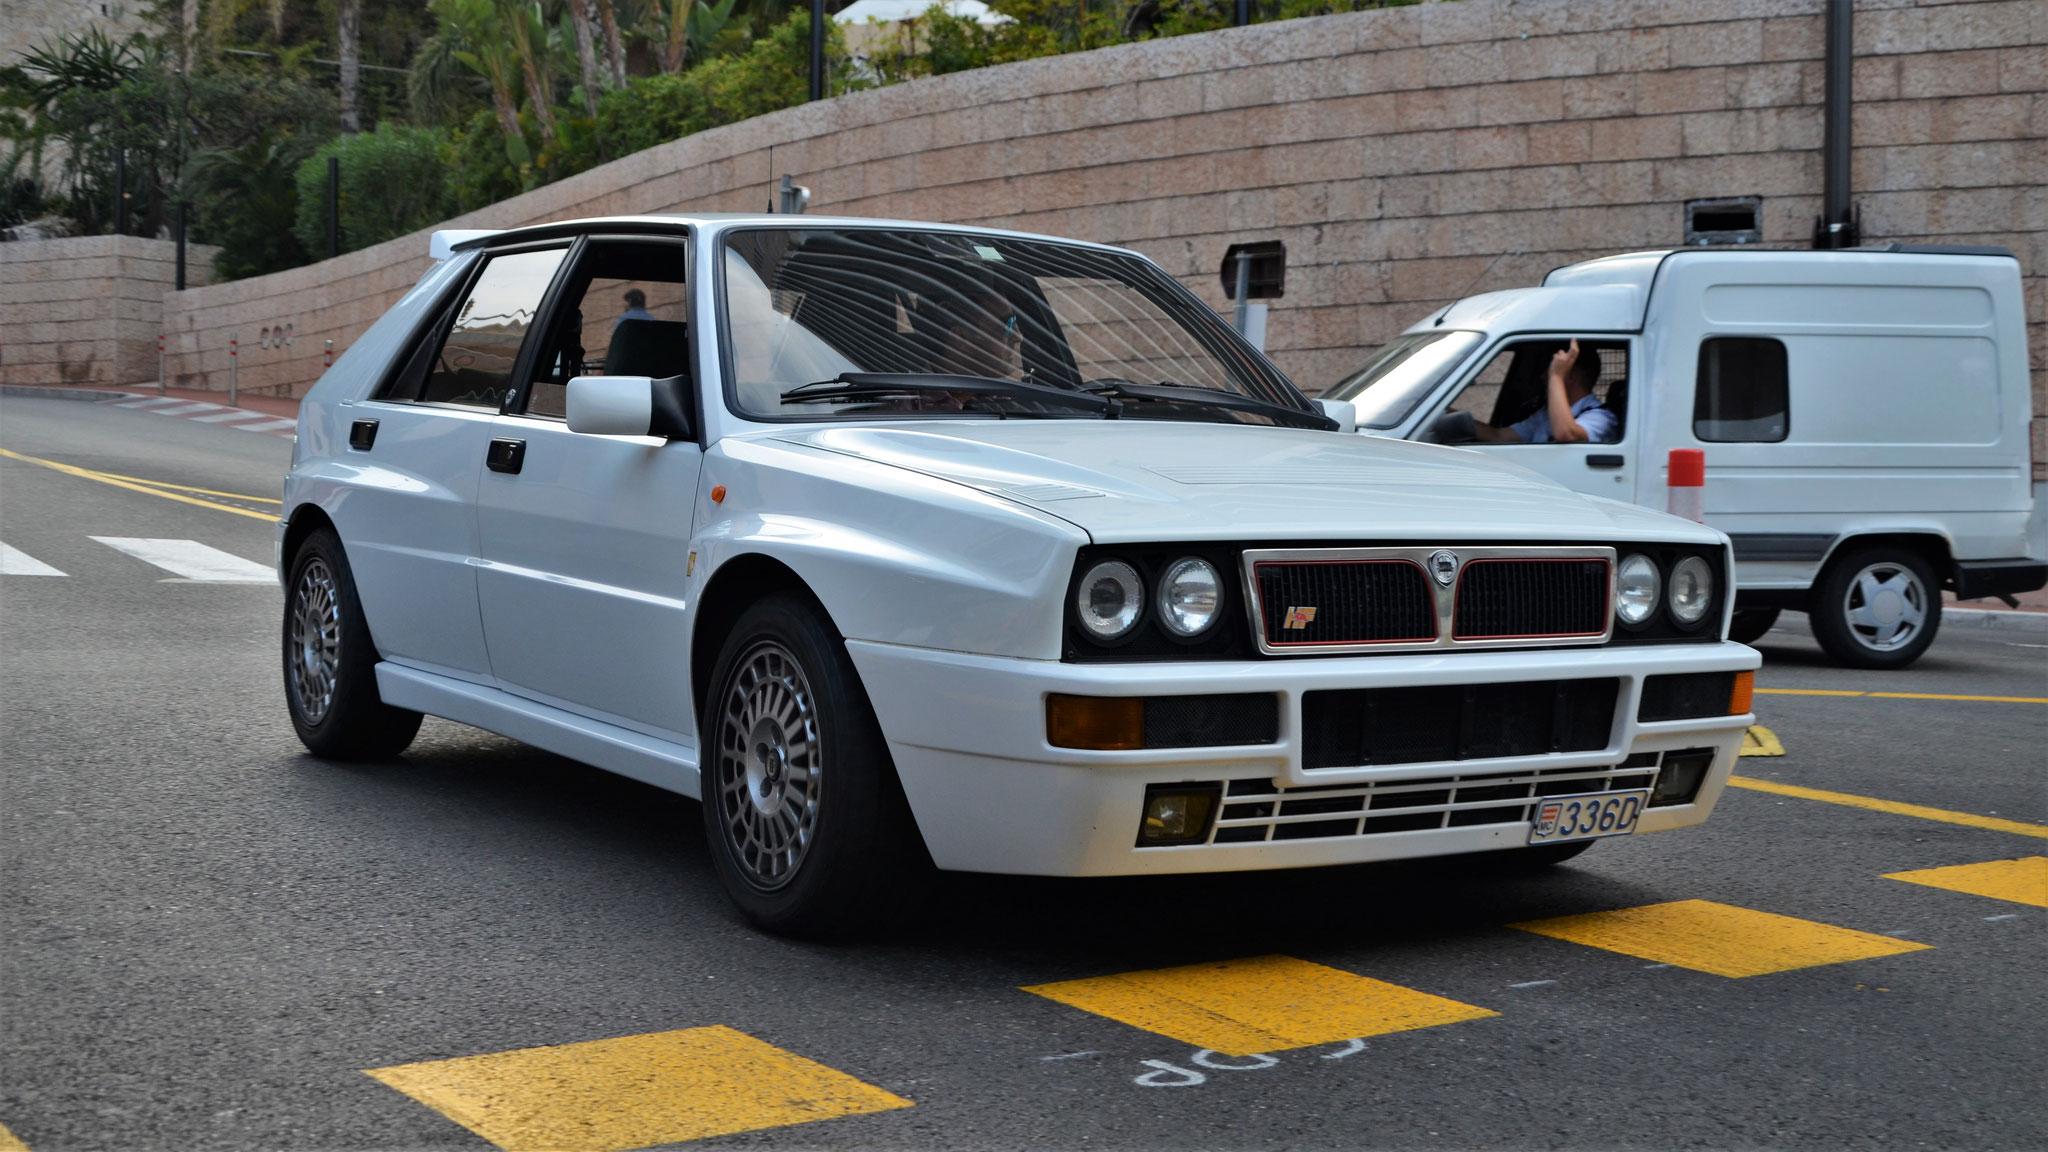 Lancia Delta HF Integrale - 336D (MC)